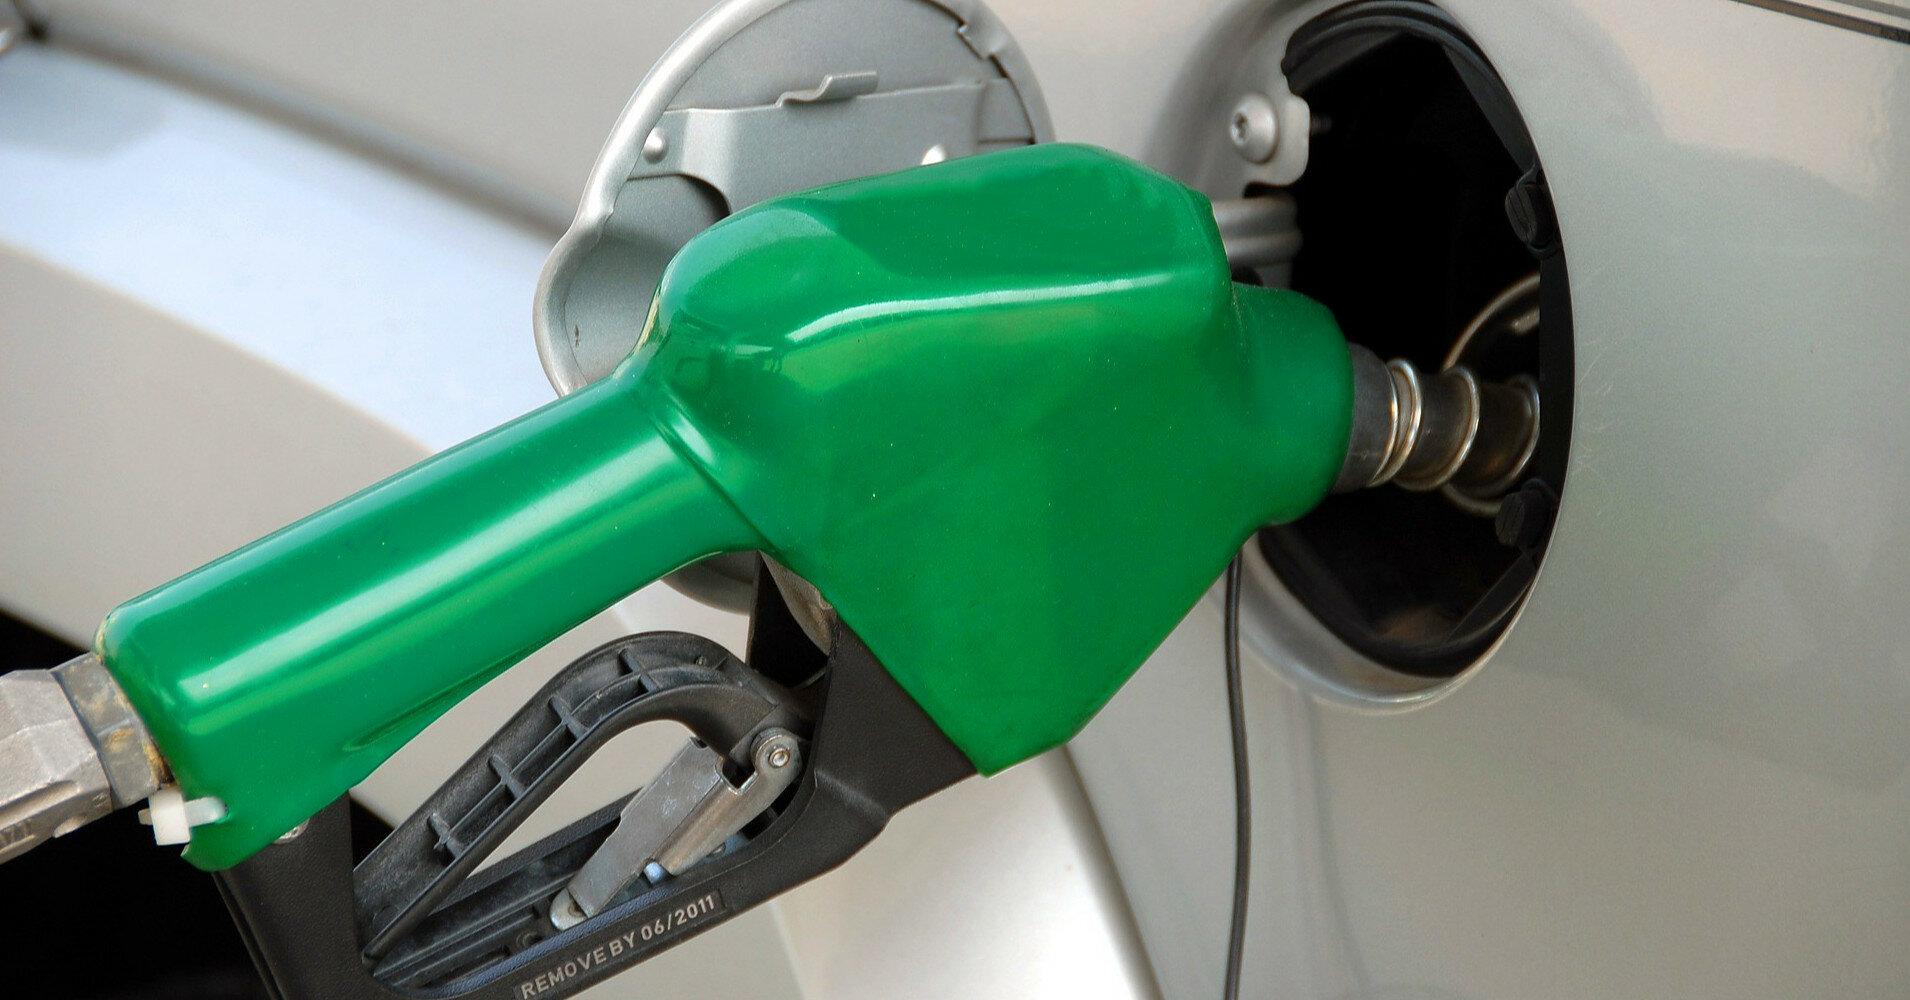 Автогаз подешевел: цены на АЗС